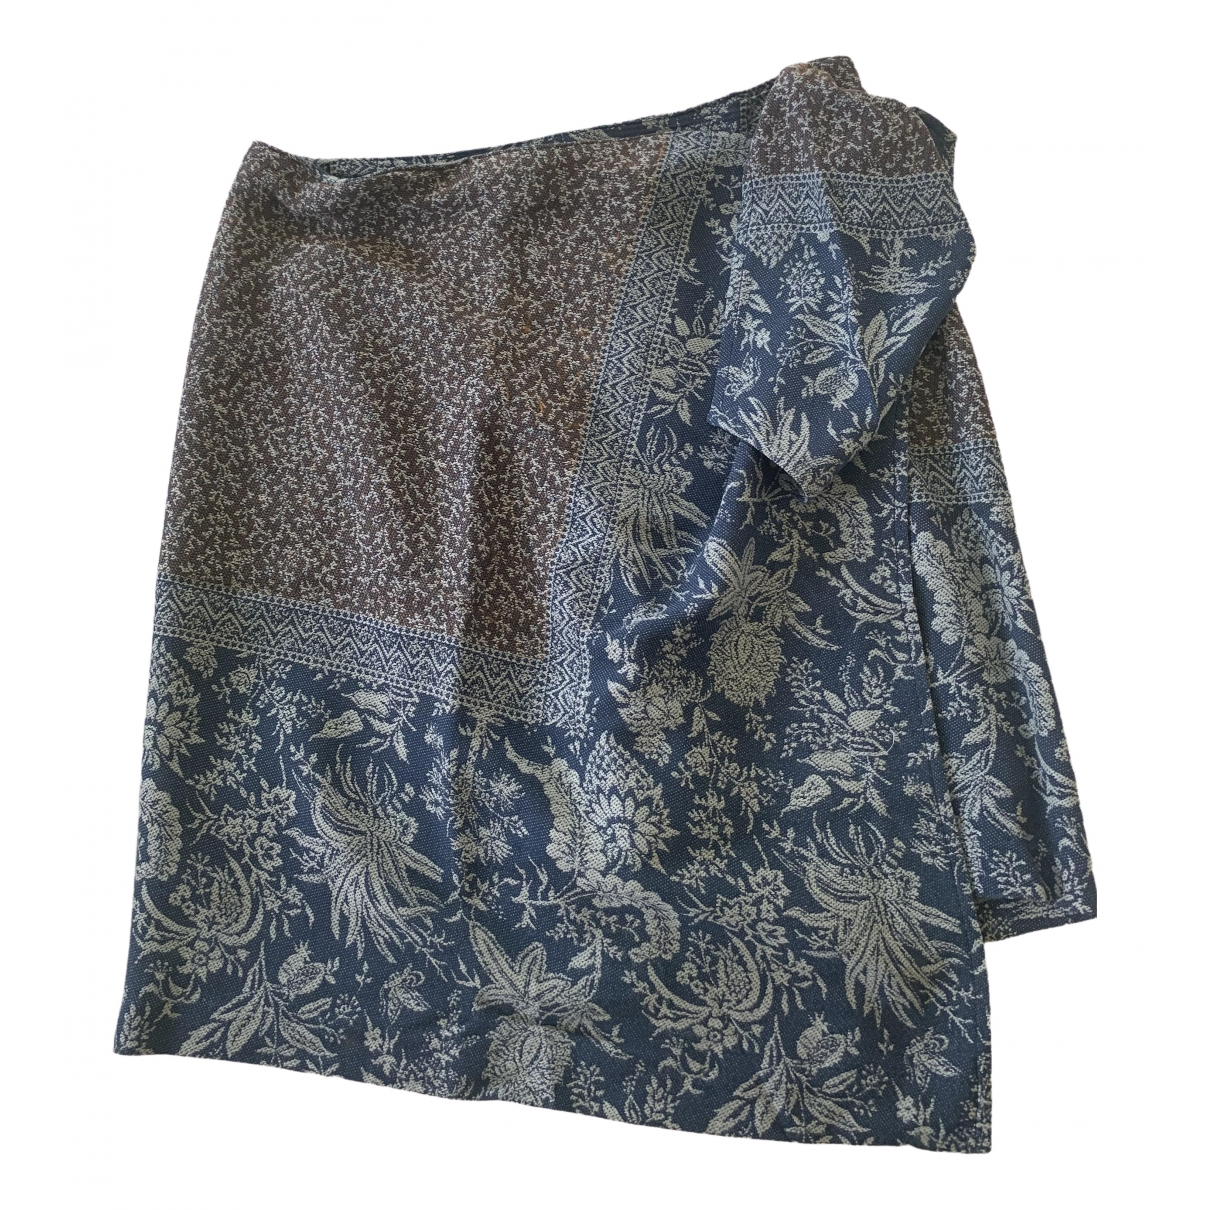 Emporio Armani \N skirt for Women 42 IT